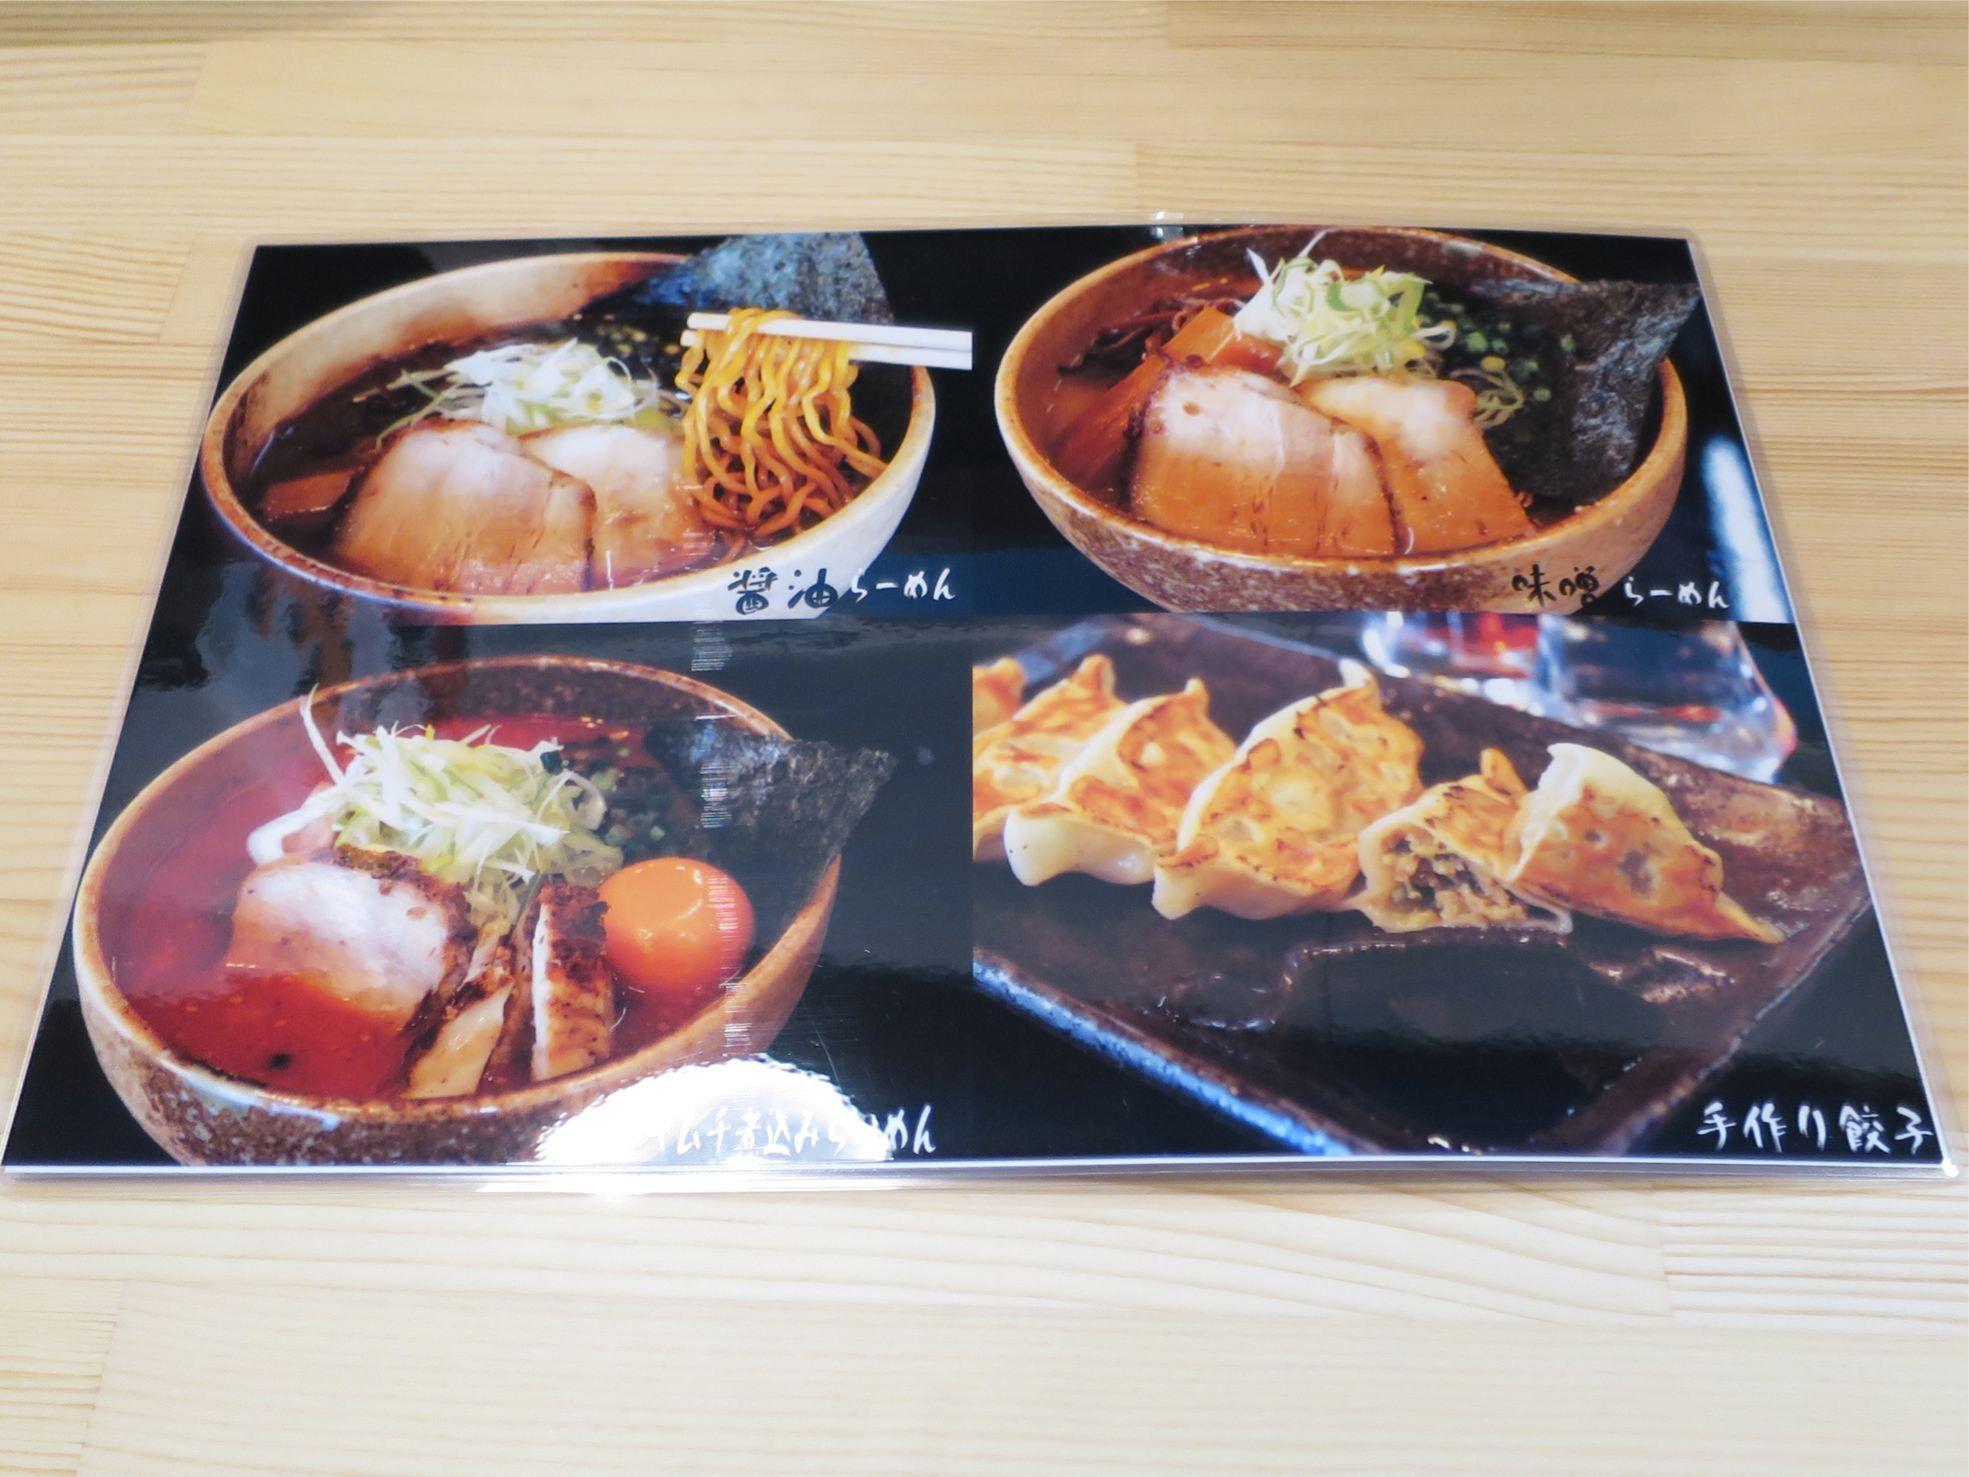 麺や 琥張玖 KOHAKU 厚別店